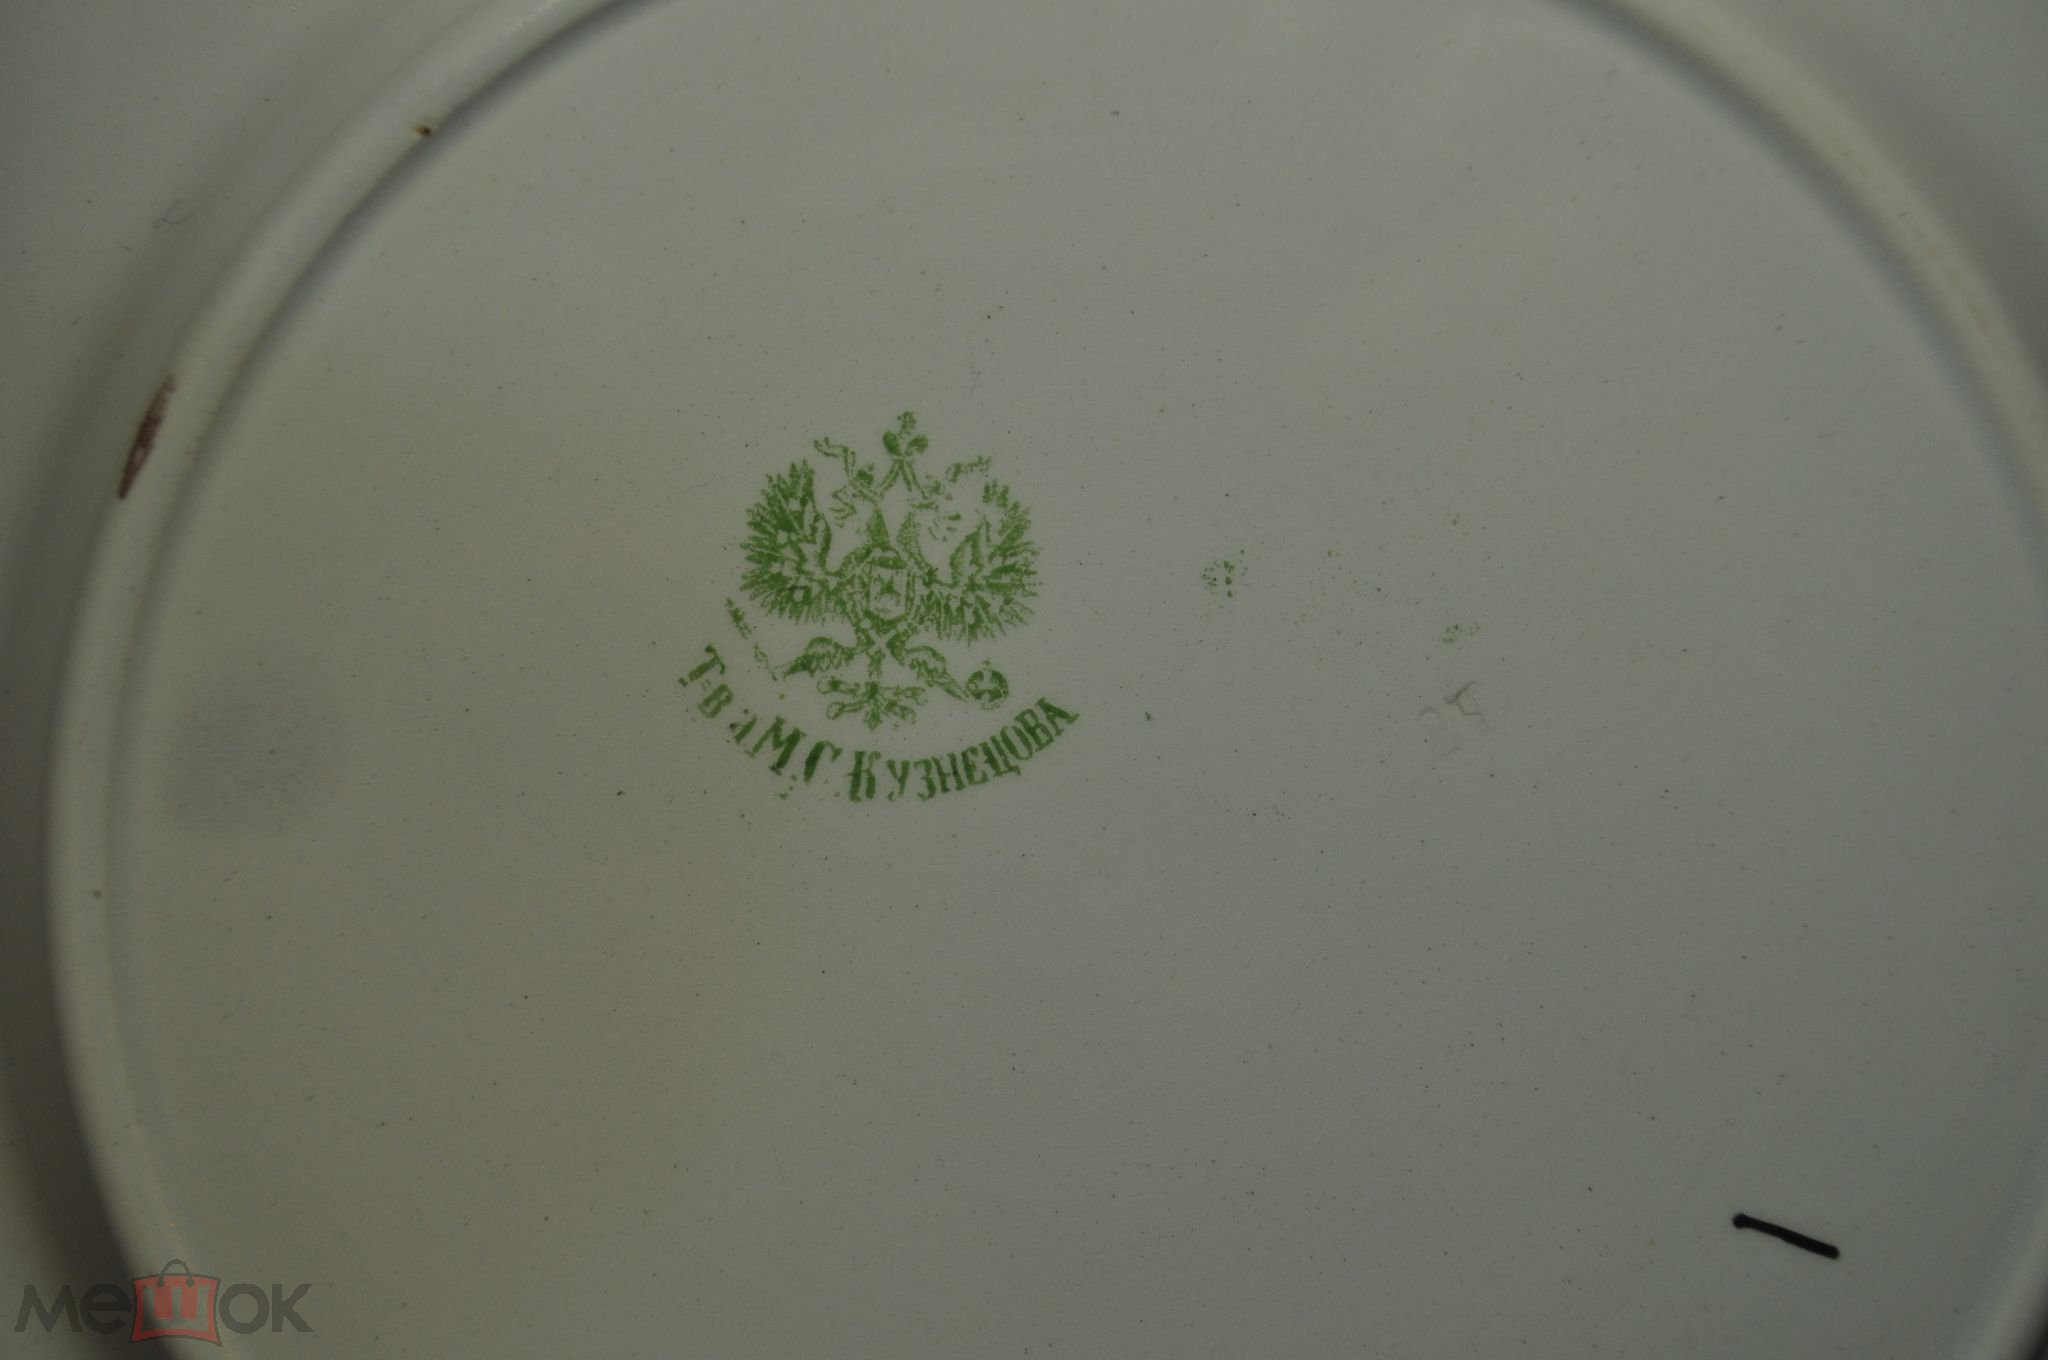 Тарелка декоративная т-во МС Кузнецова. Красавица - С рубля